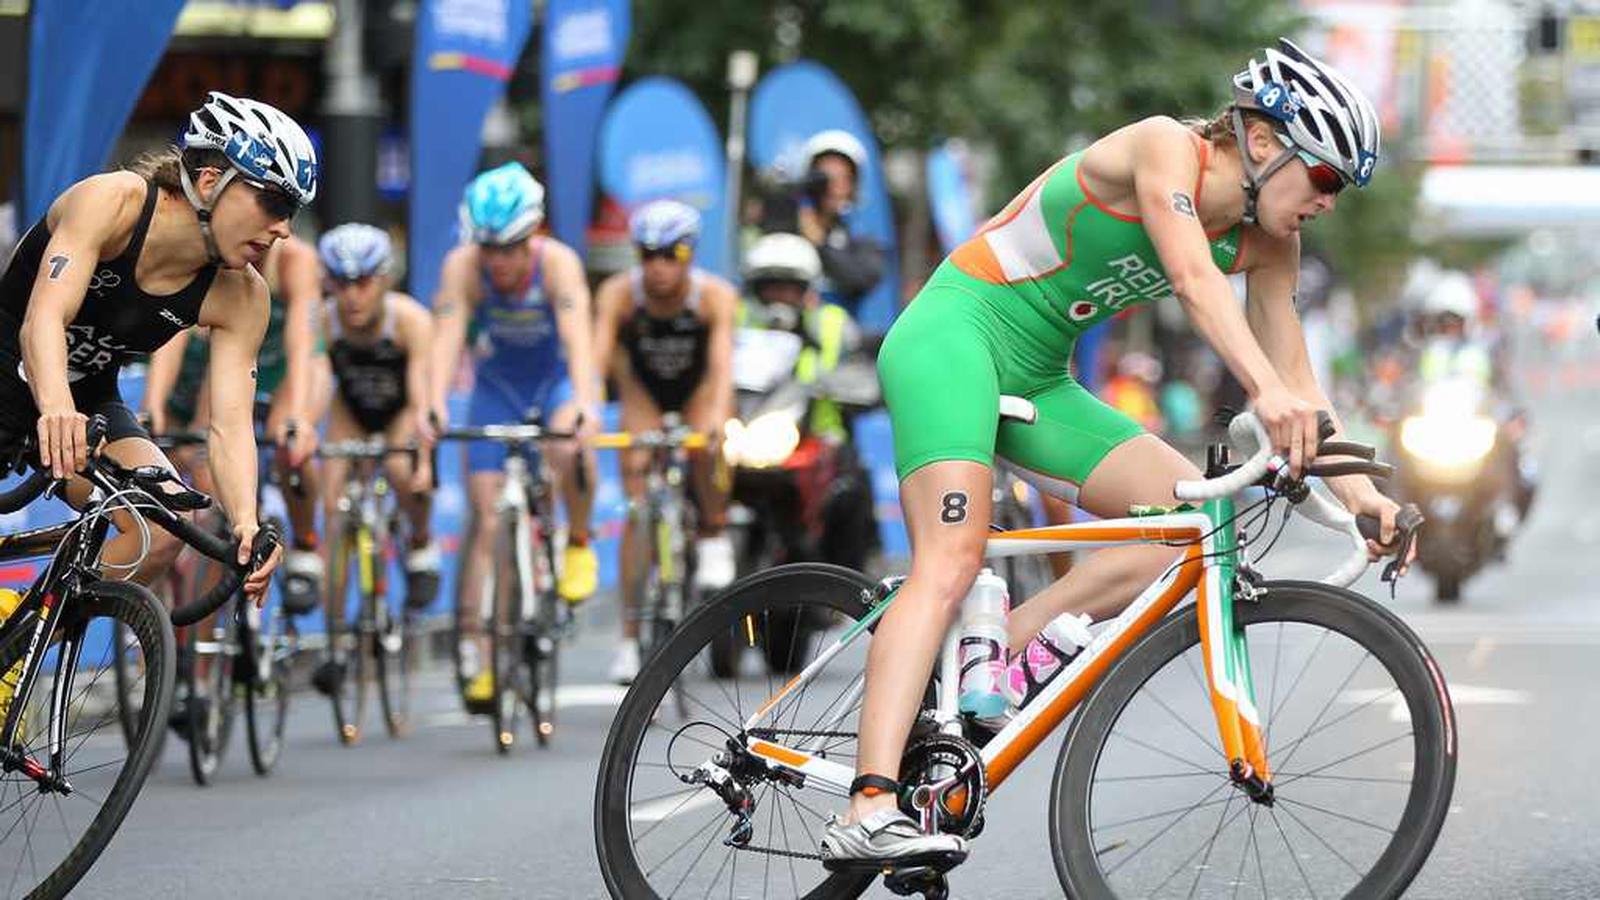 Aileen Reid targets improvement at European Games